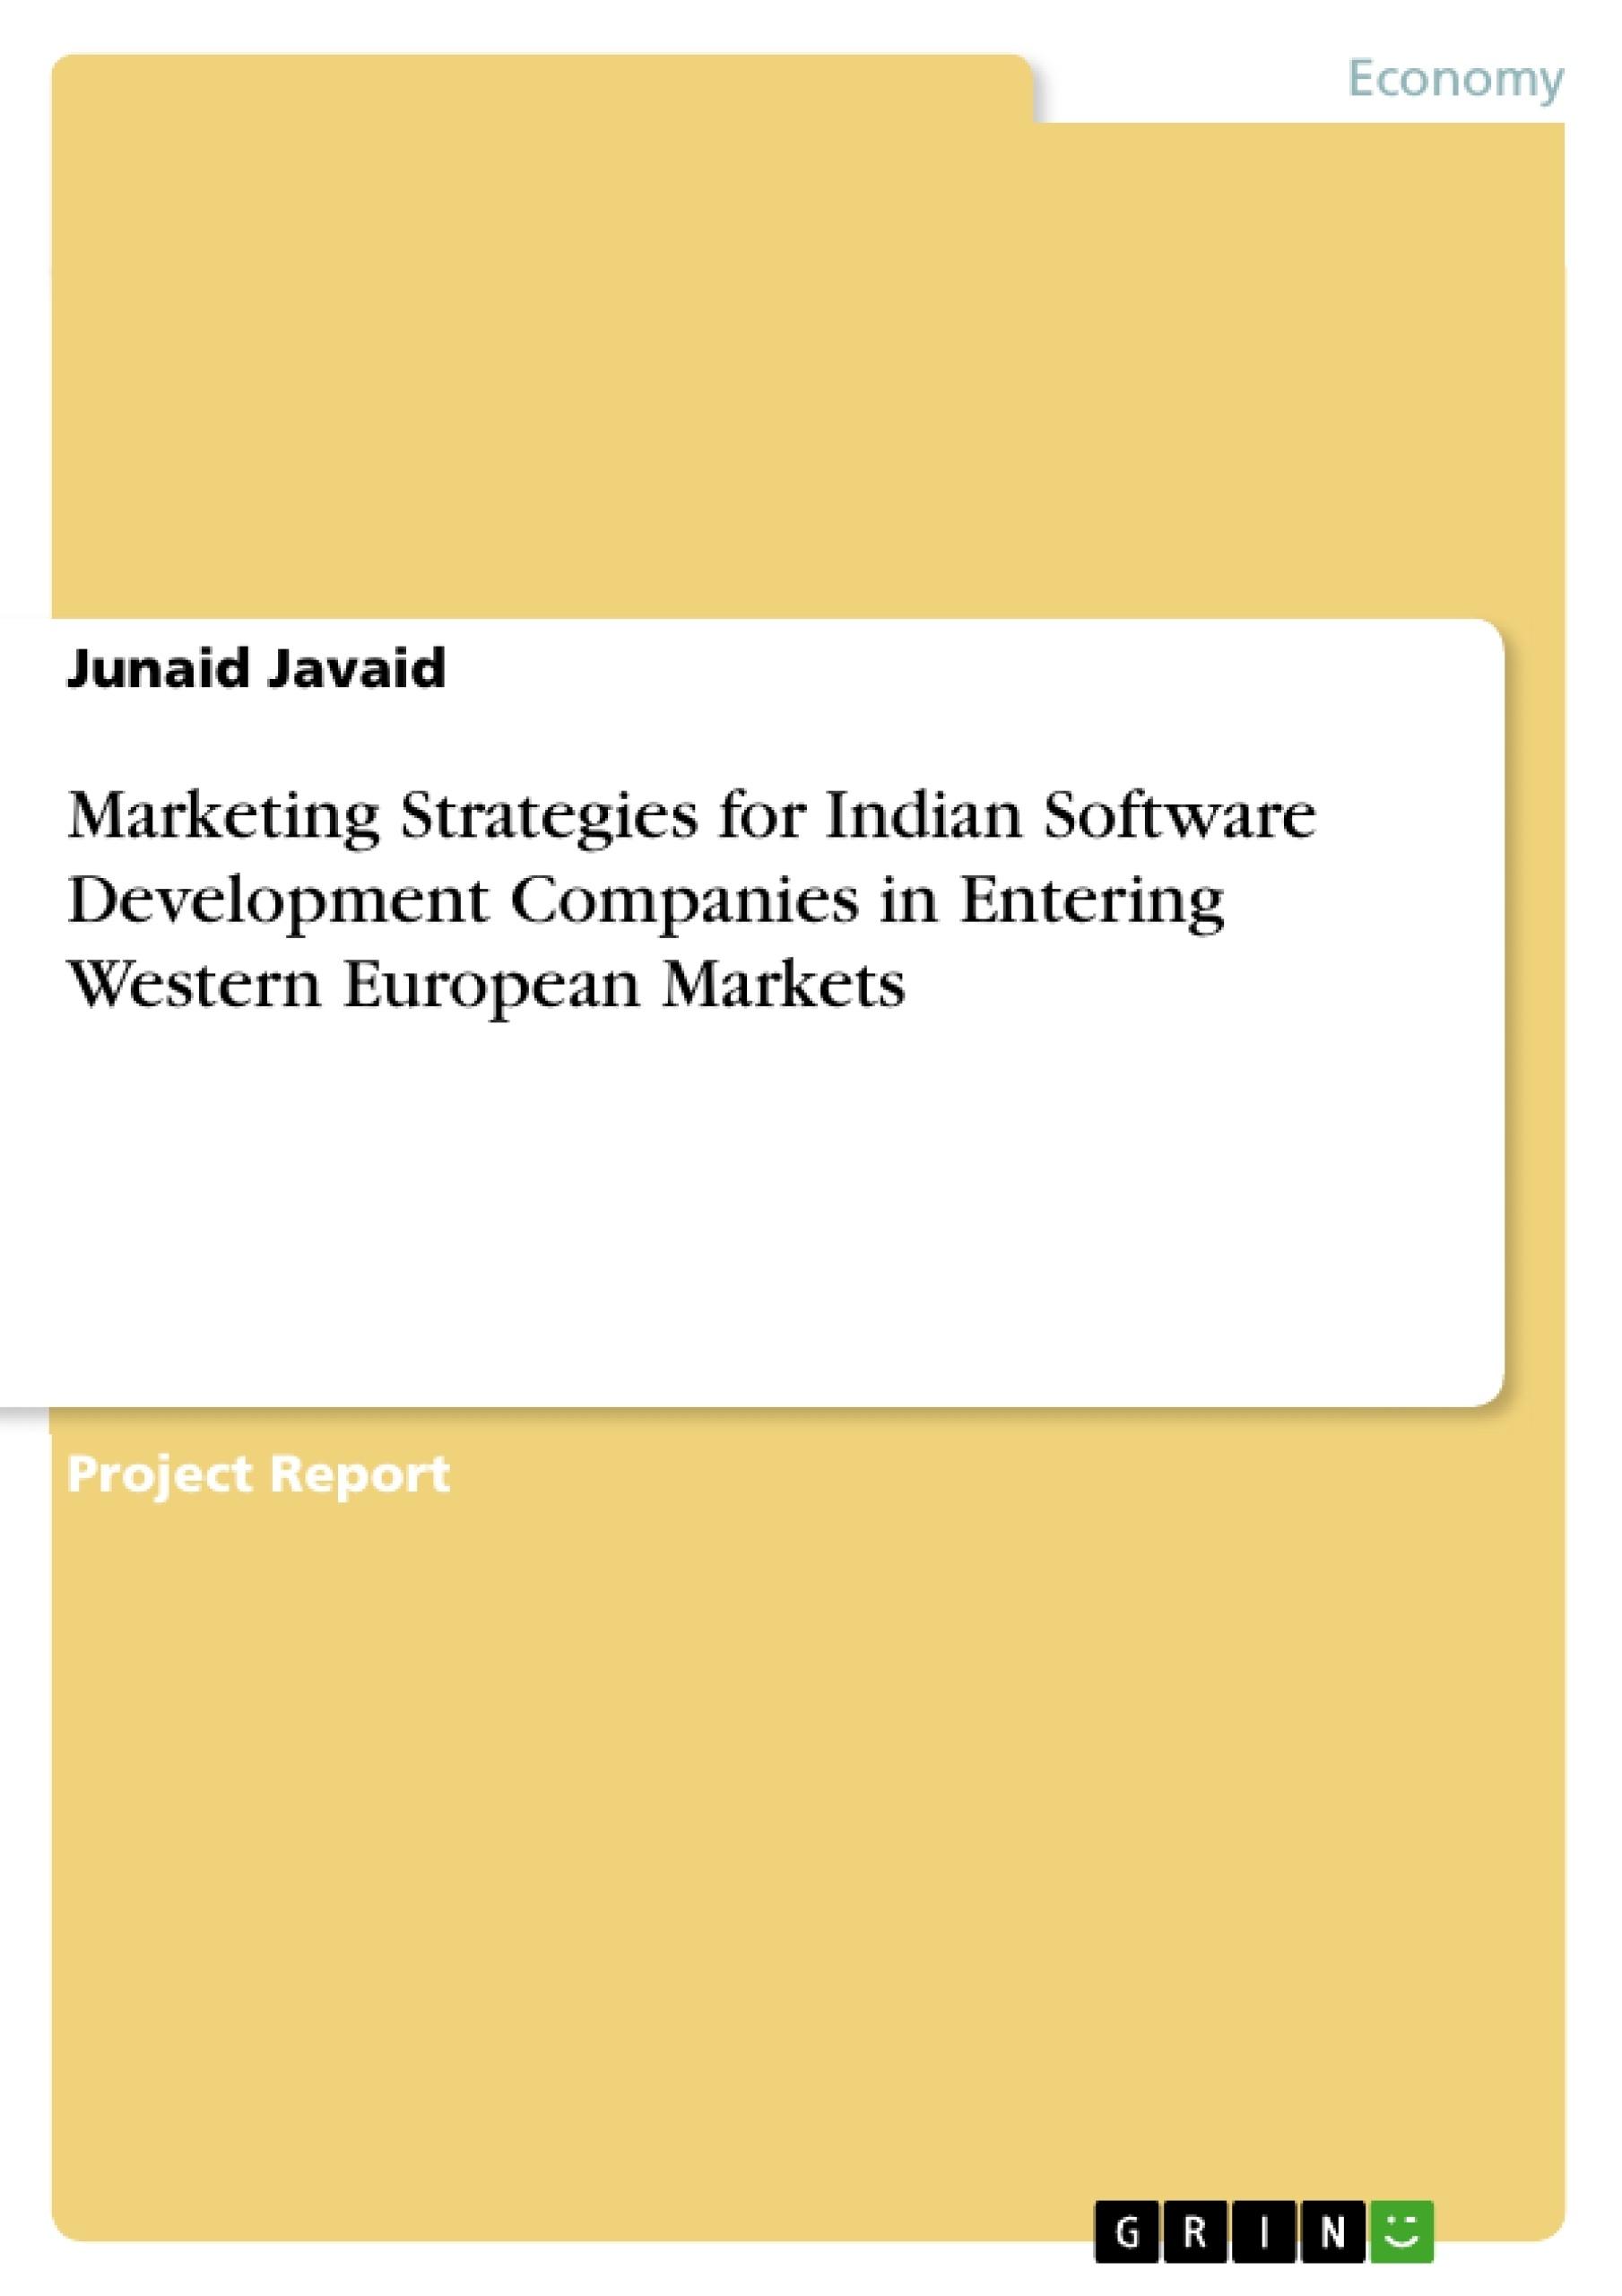 Title: Marketing Strategies for Indian Software Development Companies in Entering Western European Markets